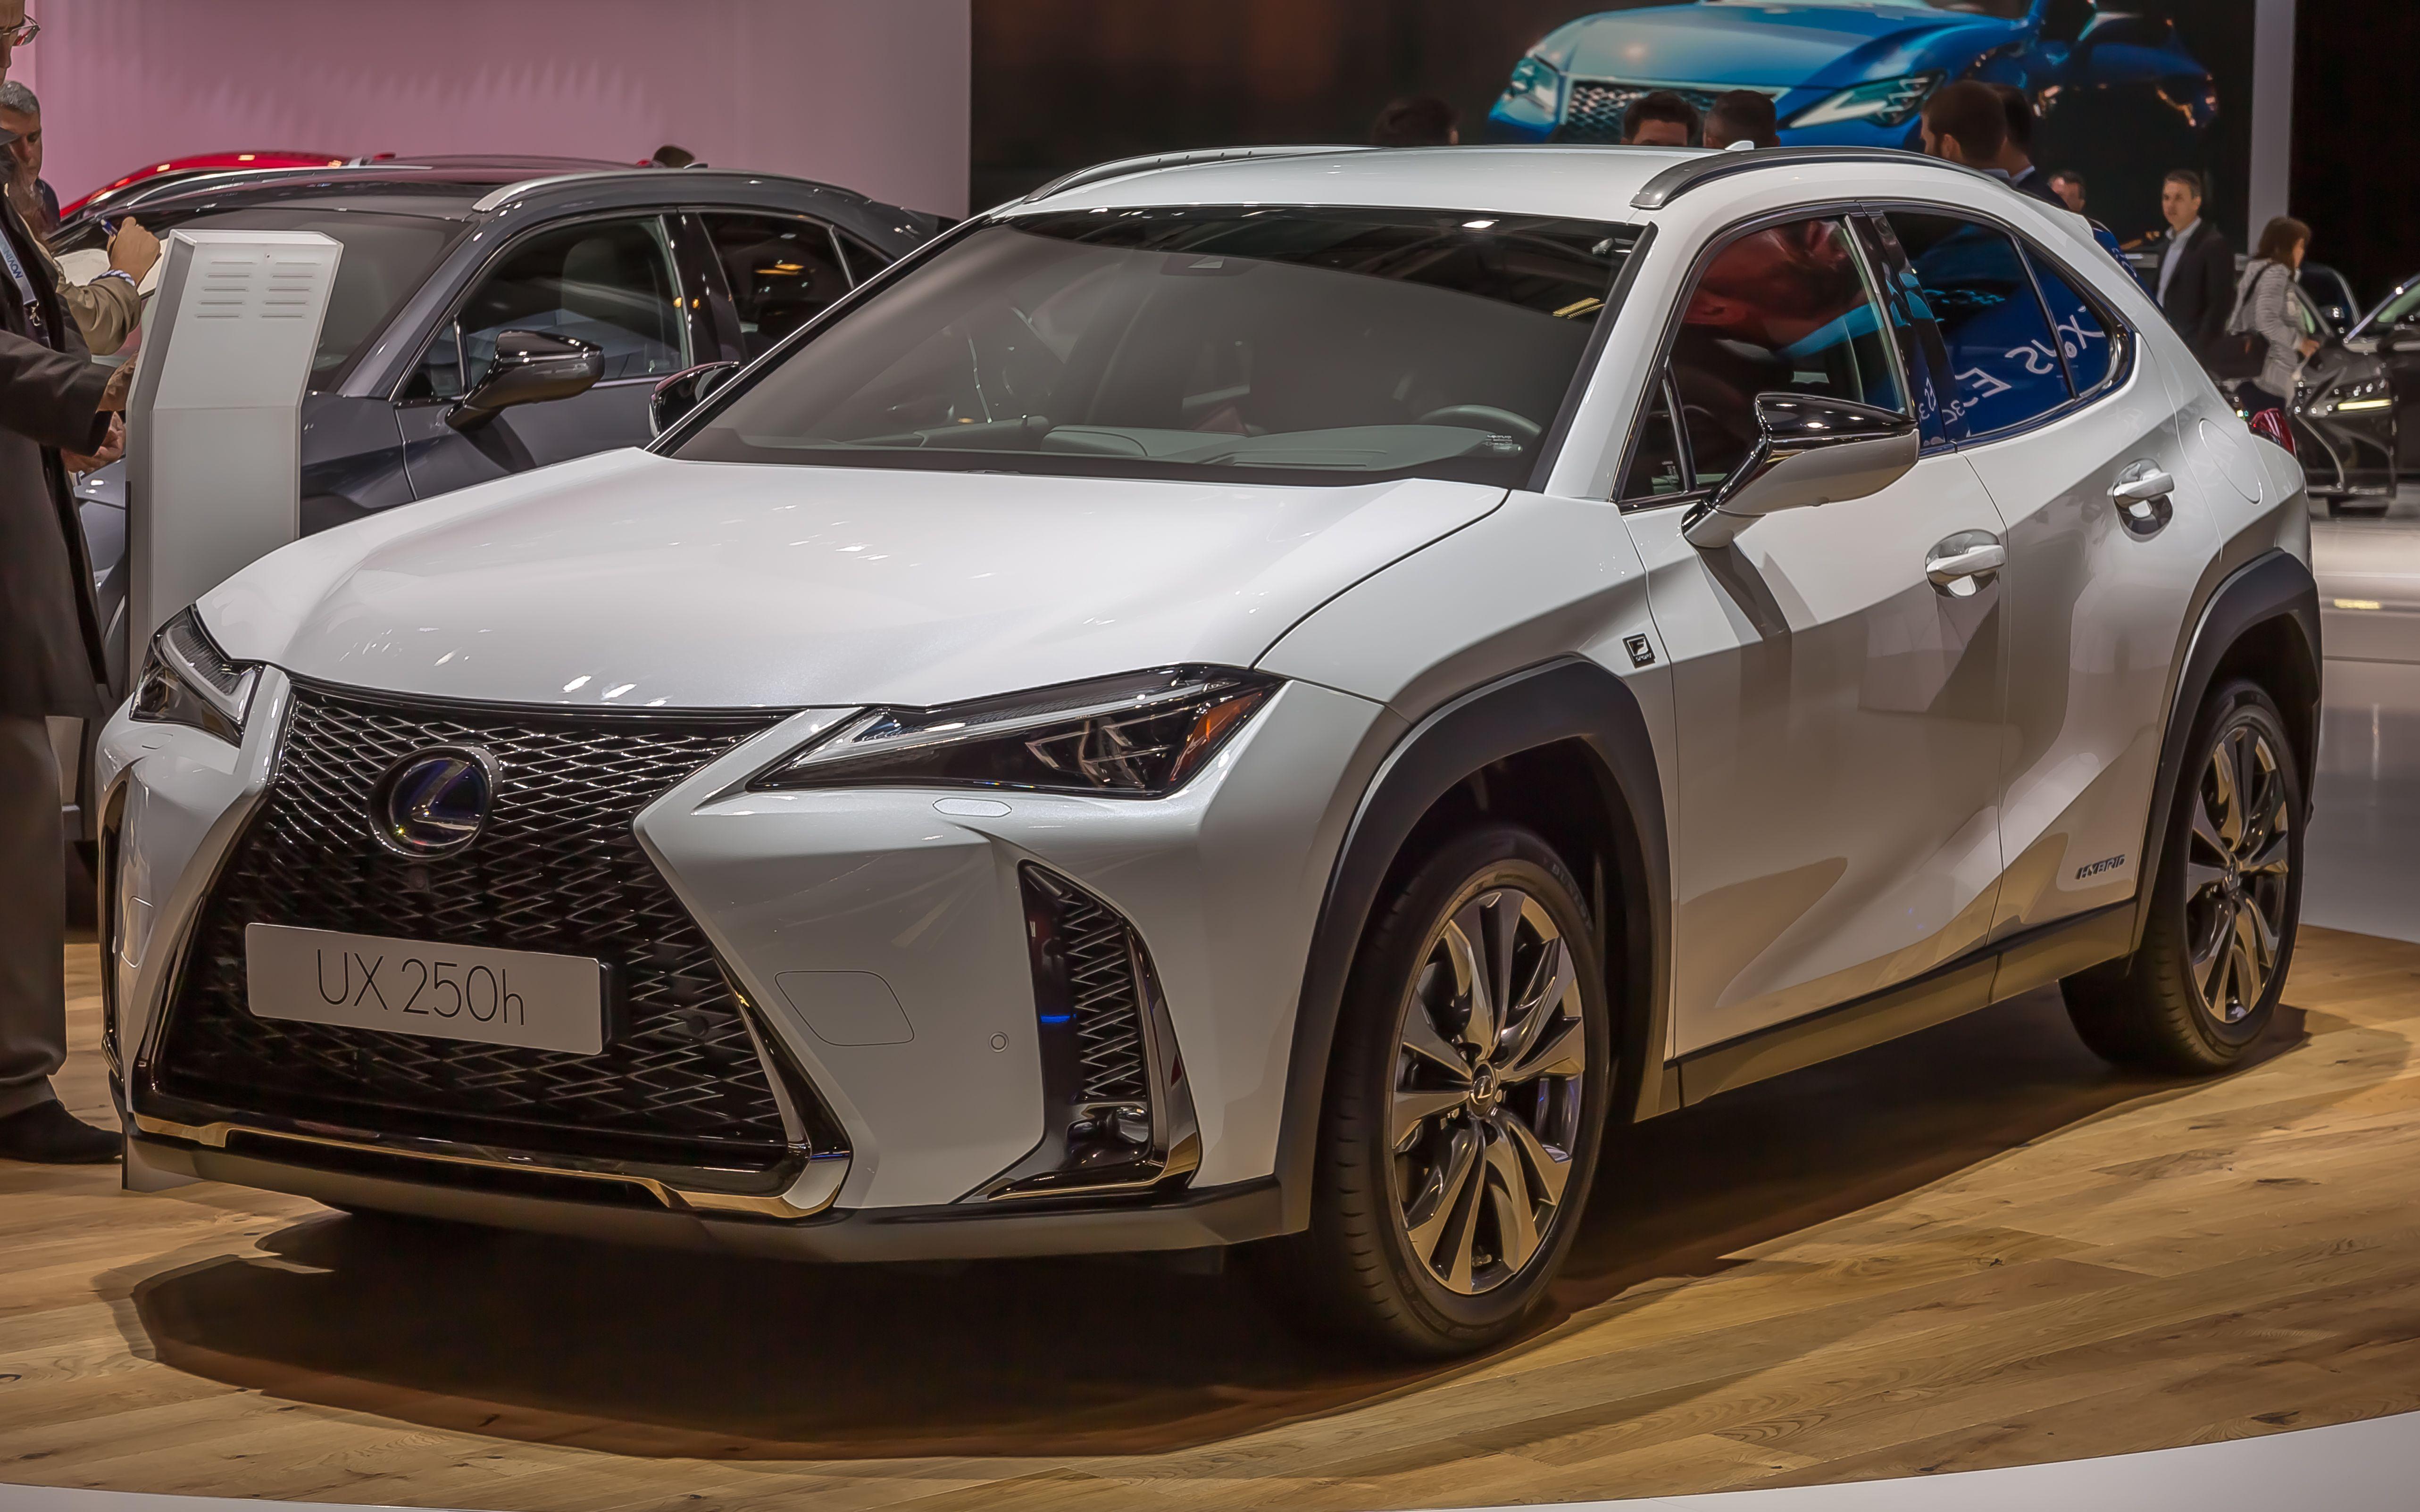 New Lexus Ux 2019 Dimensions Price And Release Date New Lexus Lexus Lc Lexus Cars